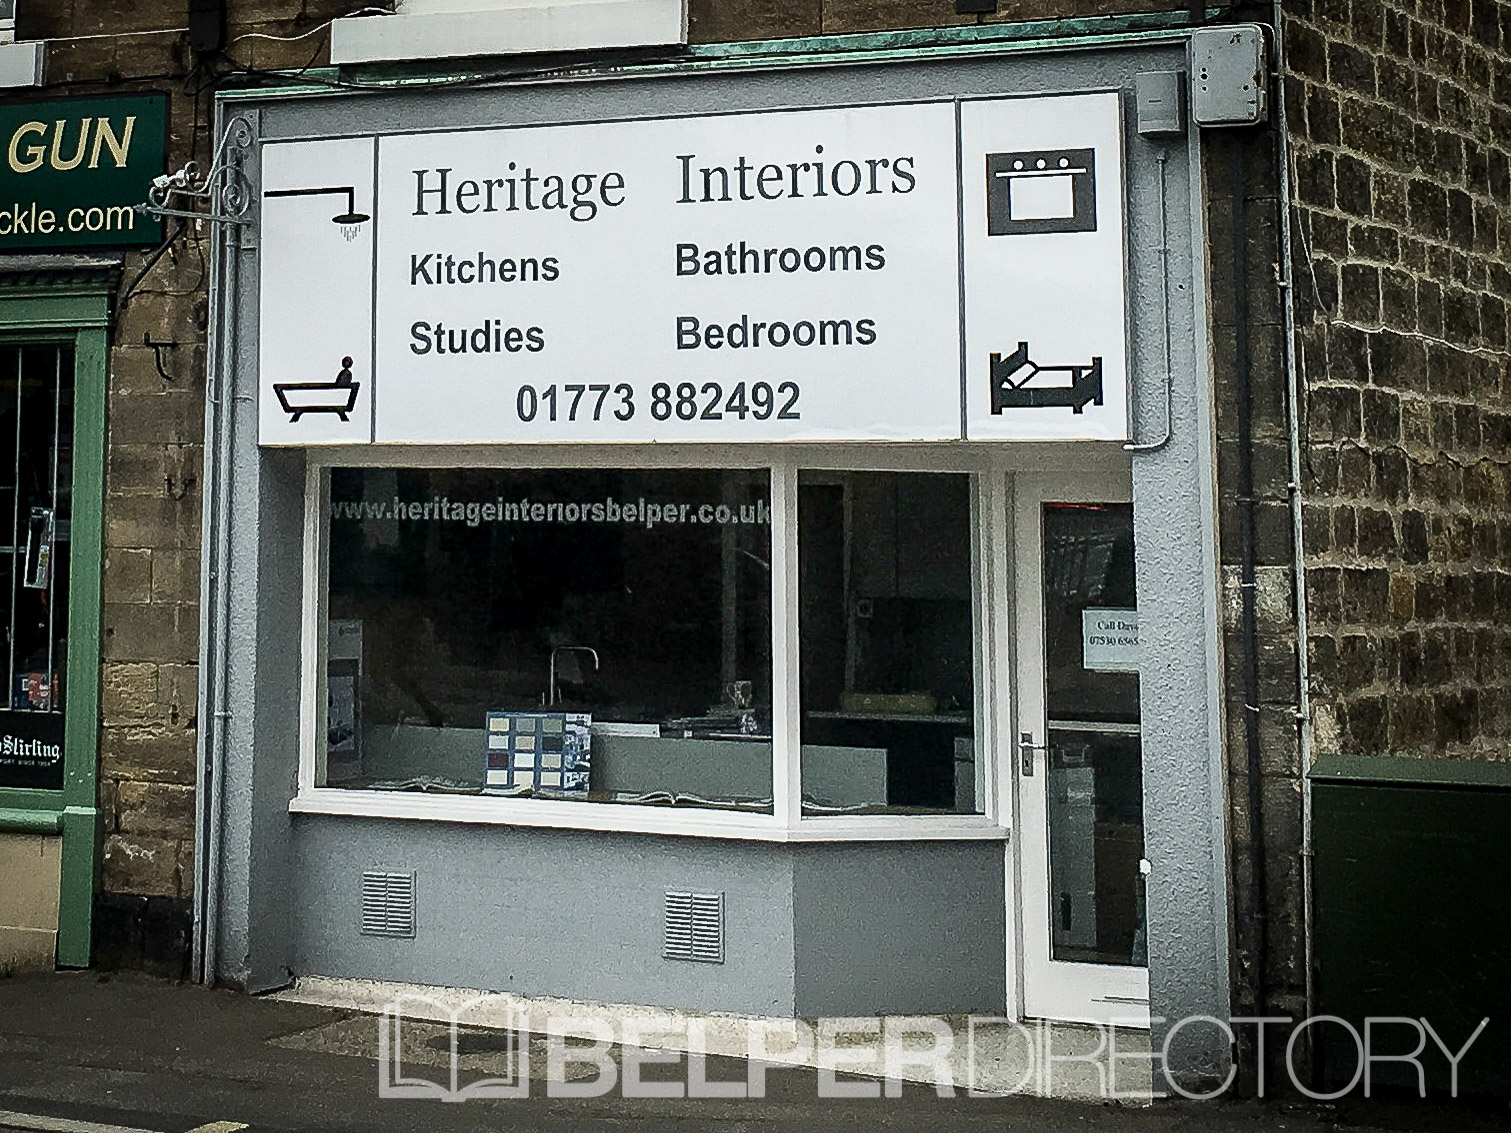 Heritage Interiors Belper on Inter Search